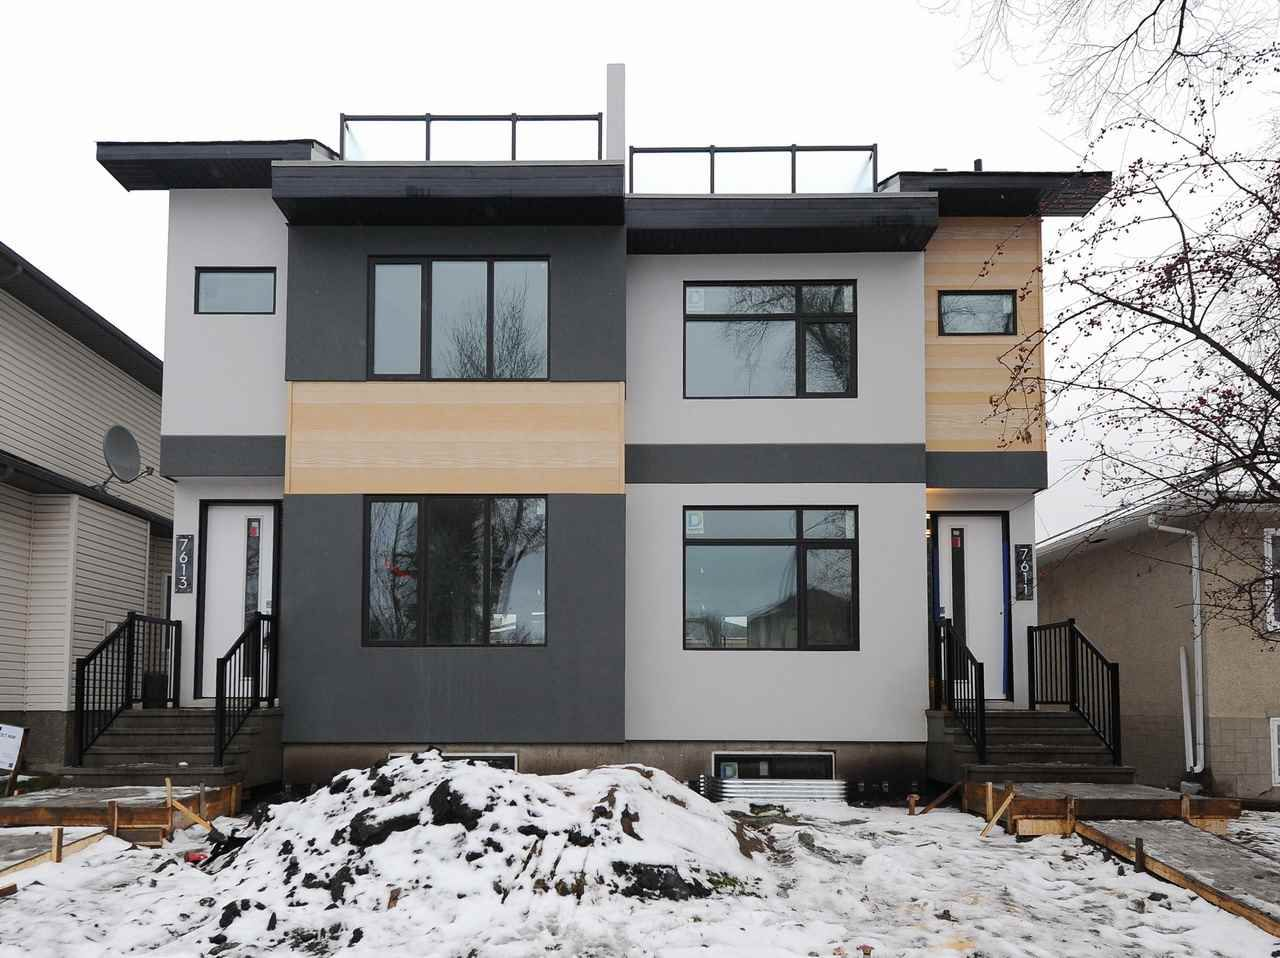 Main Photo: 7611 110 Street in Edmonton: Zone 15 House Half Duplex for sale : MLS®# E4144039